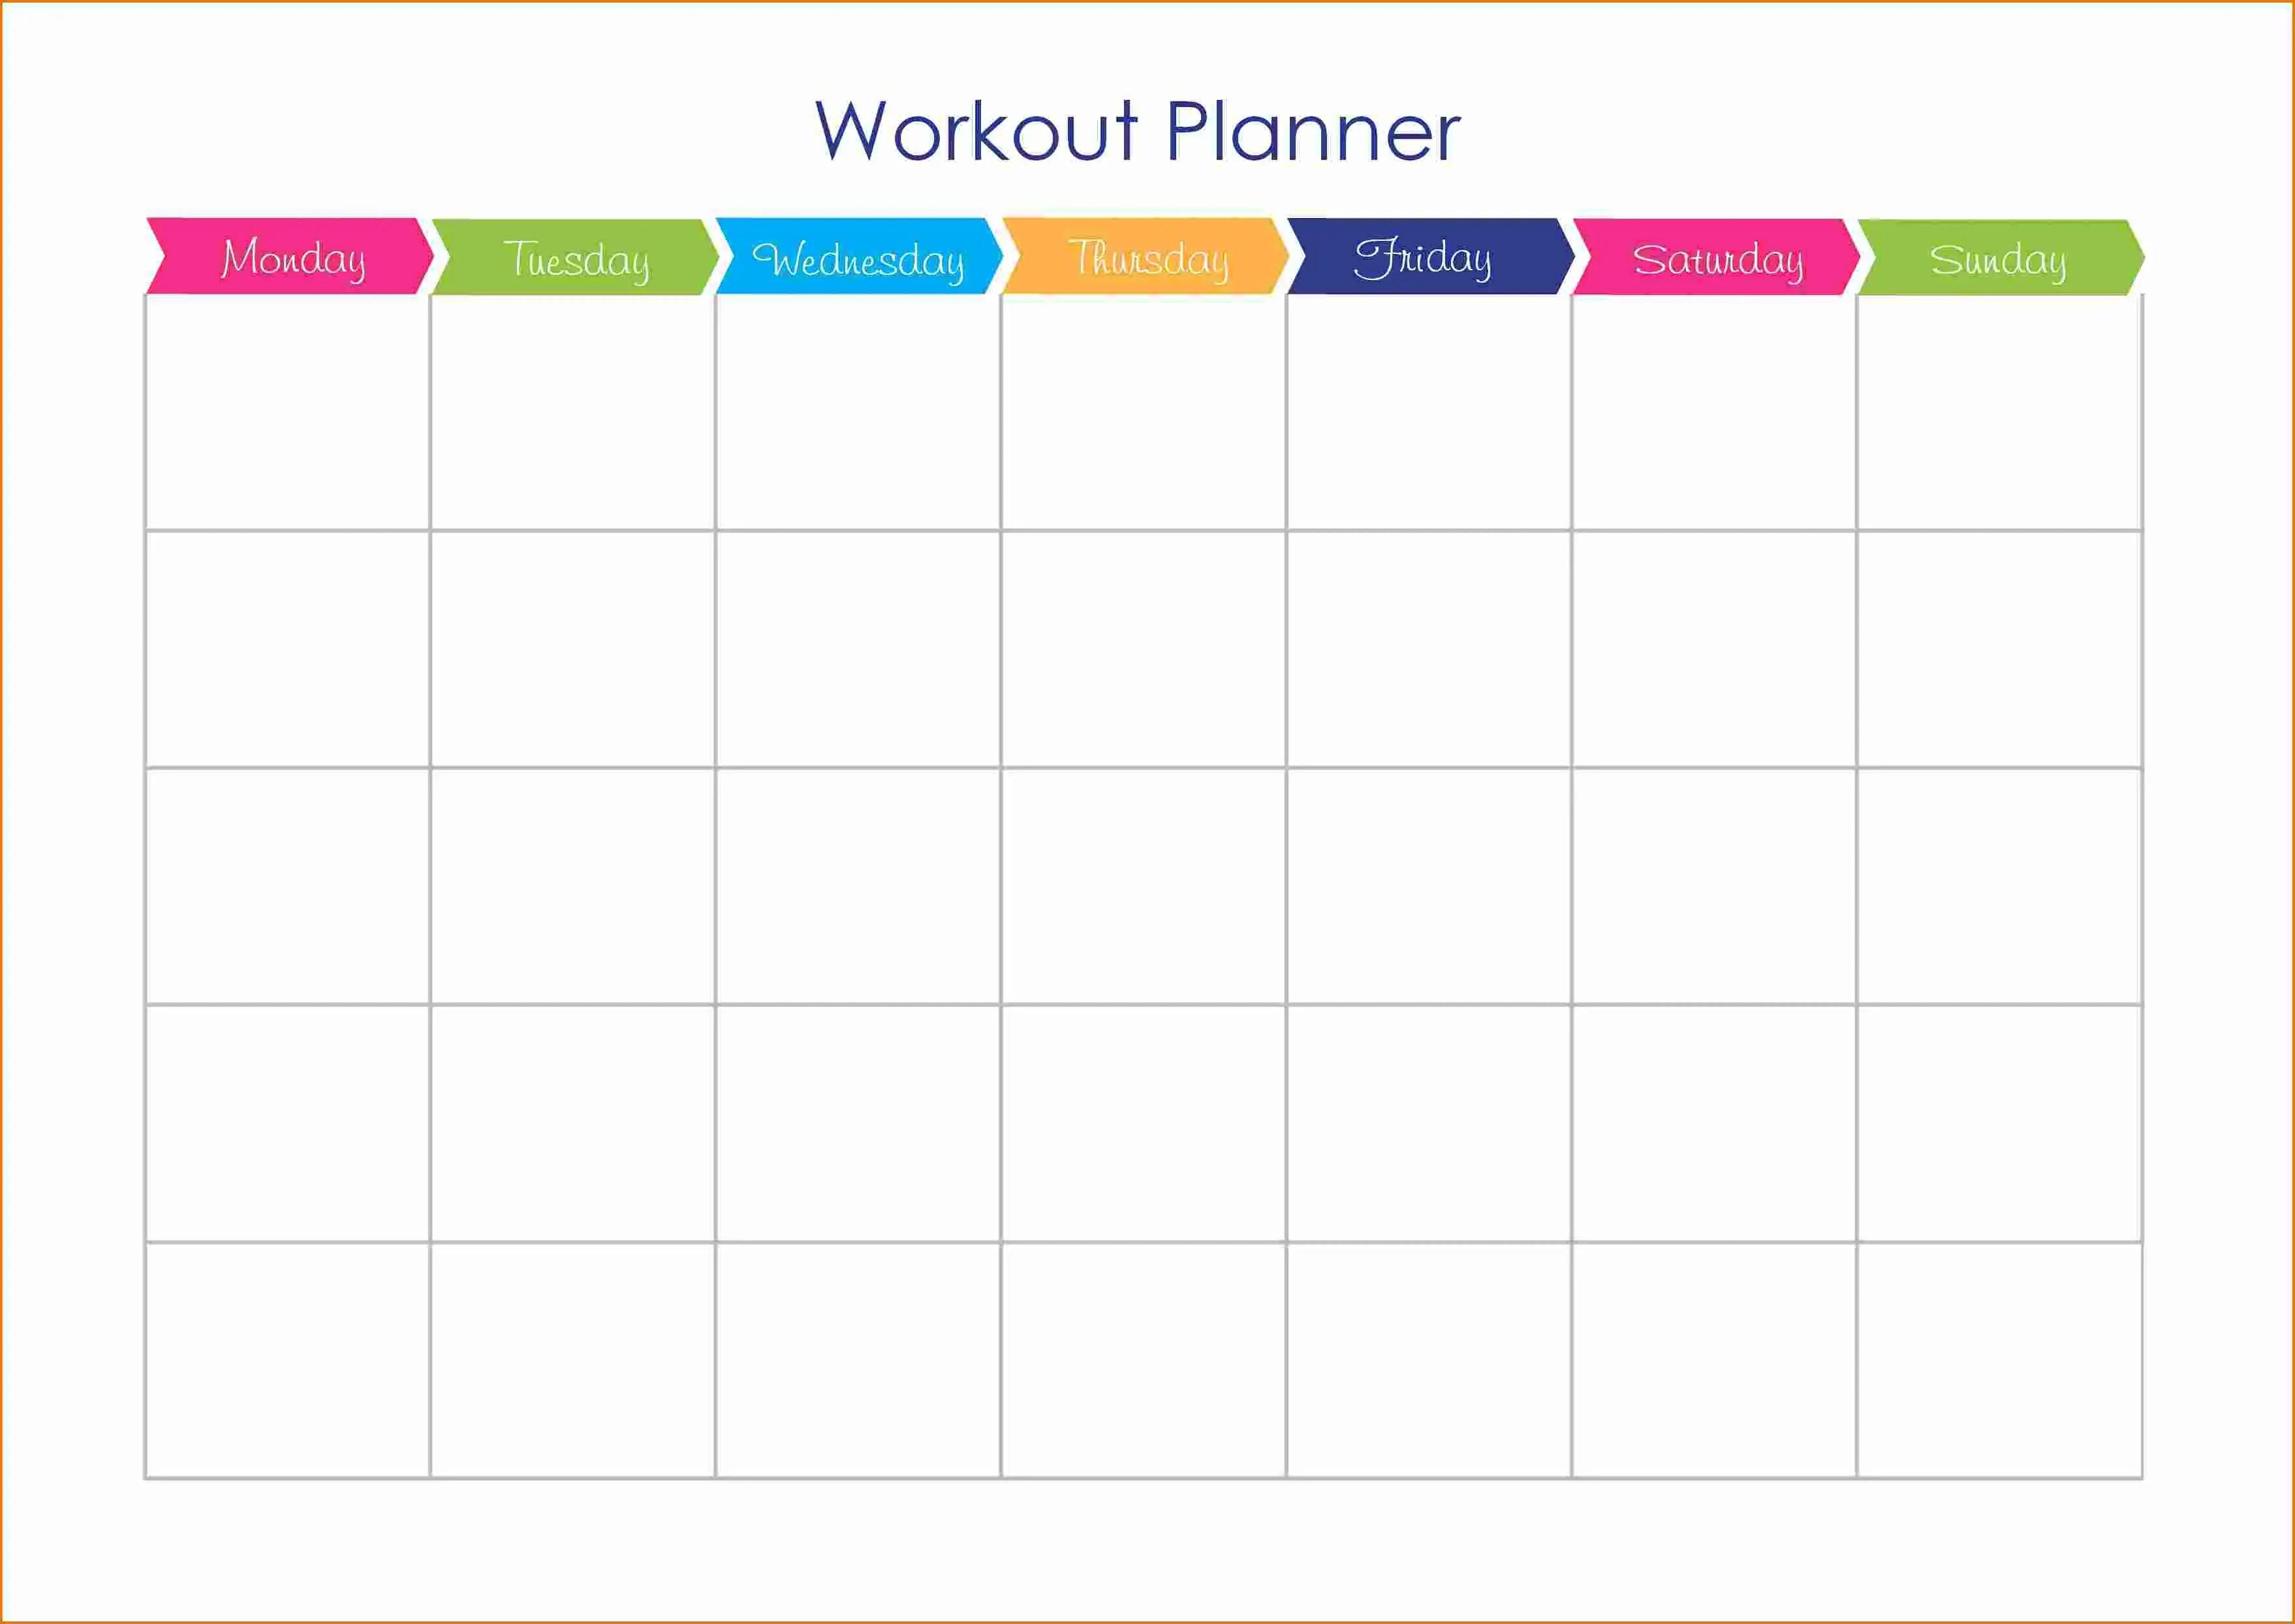 19 Utilitarian Workout Calendar Templates